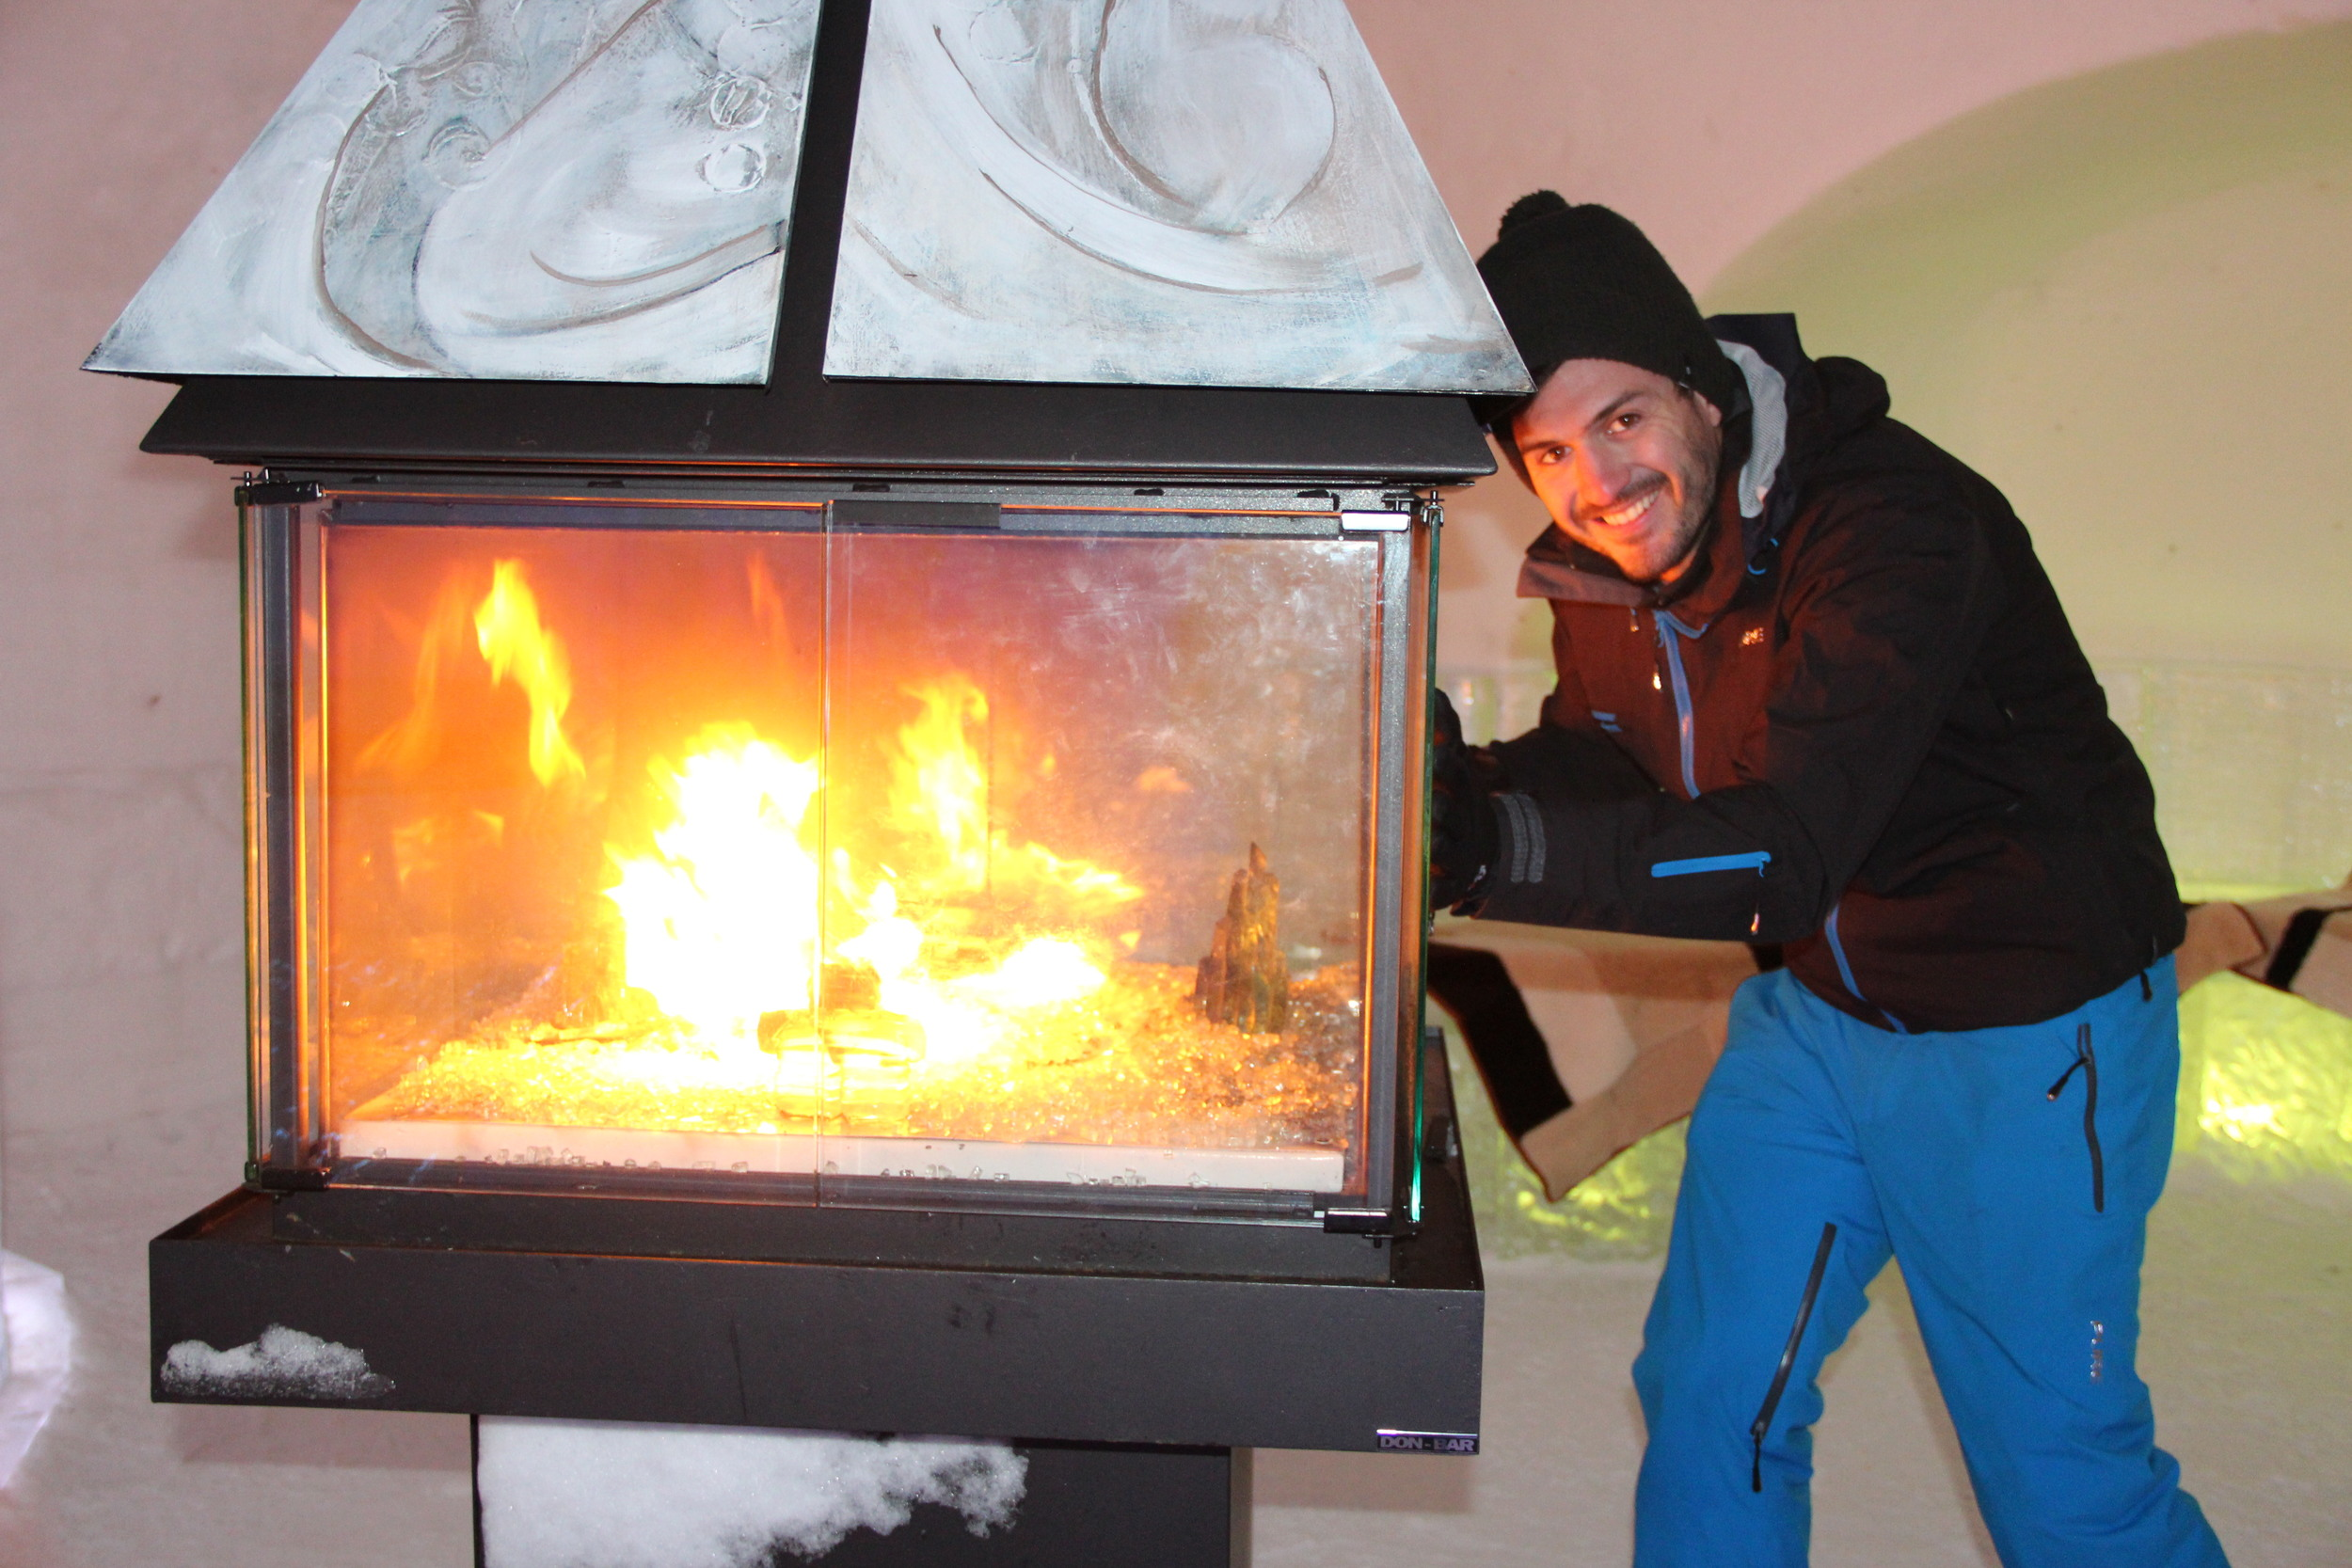 Pure Snow Karl about town jacket Niagara Falls.JPG